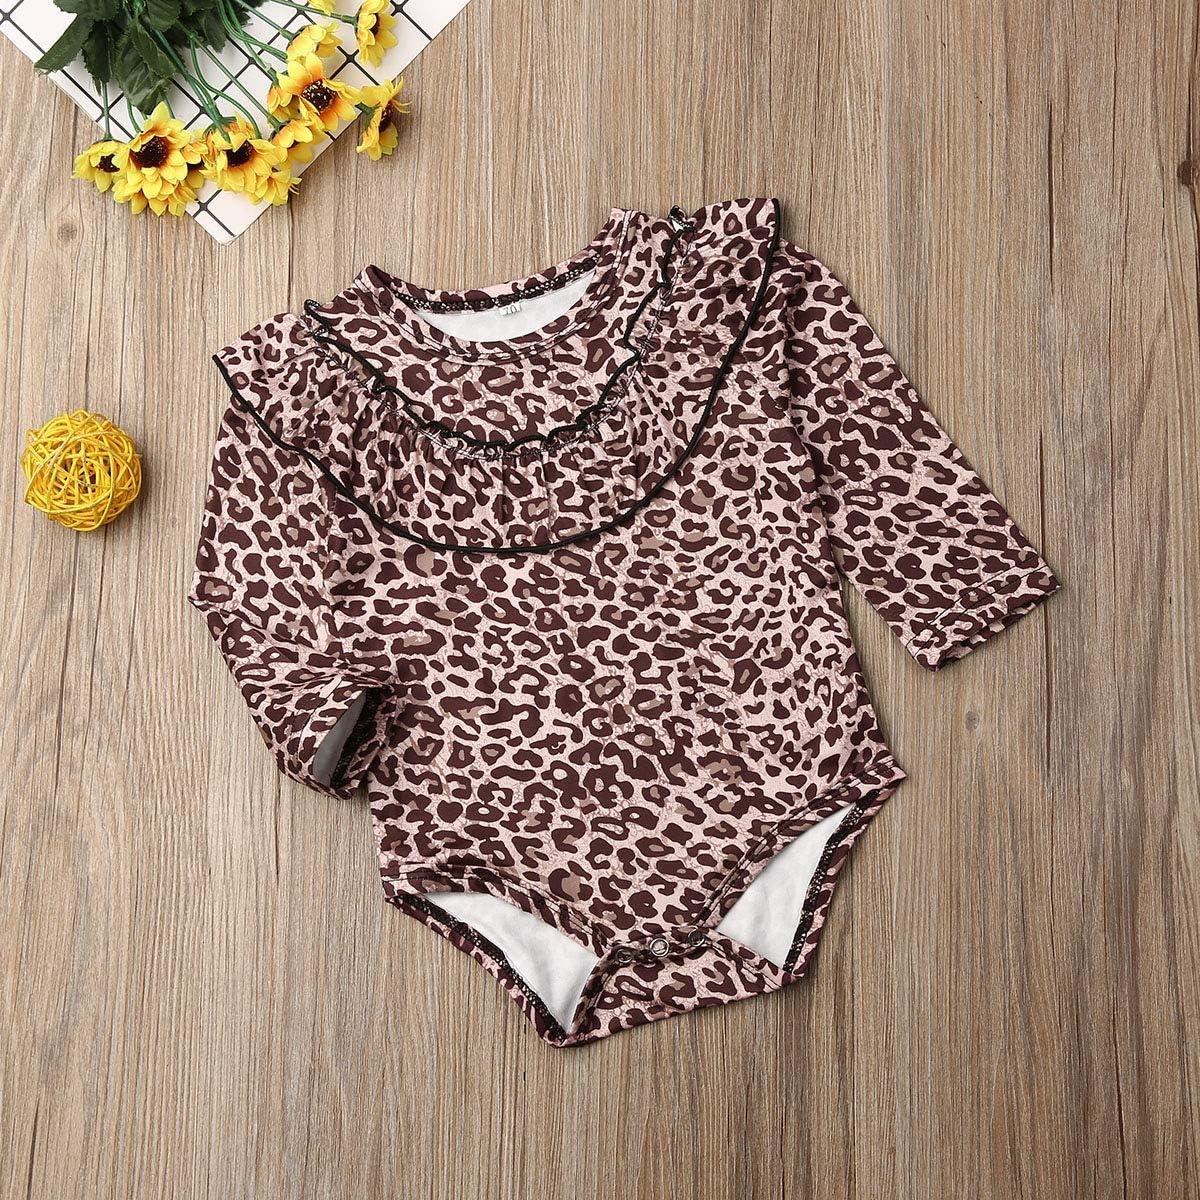 Pineapple I Love Big Coconuts Baby Boys Girls Jumpsuits Short Sleeve Romper Bodysuit Bodysuit Jumpsuit Outfits Black